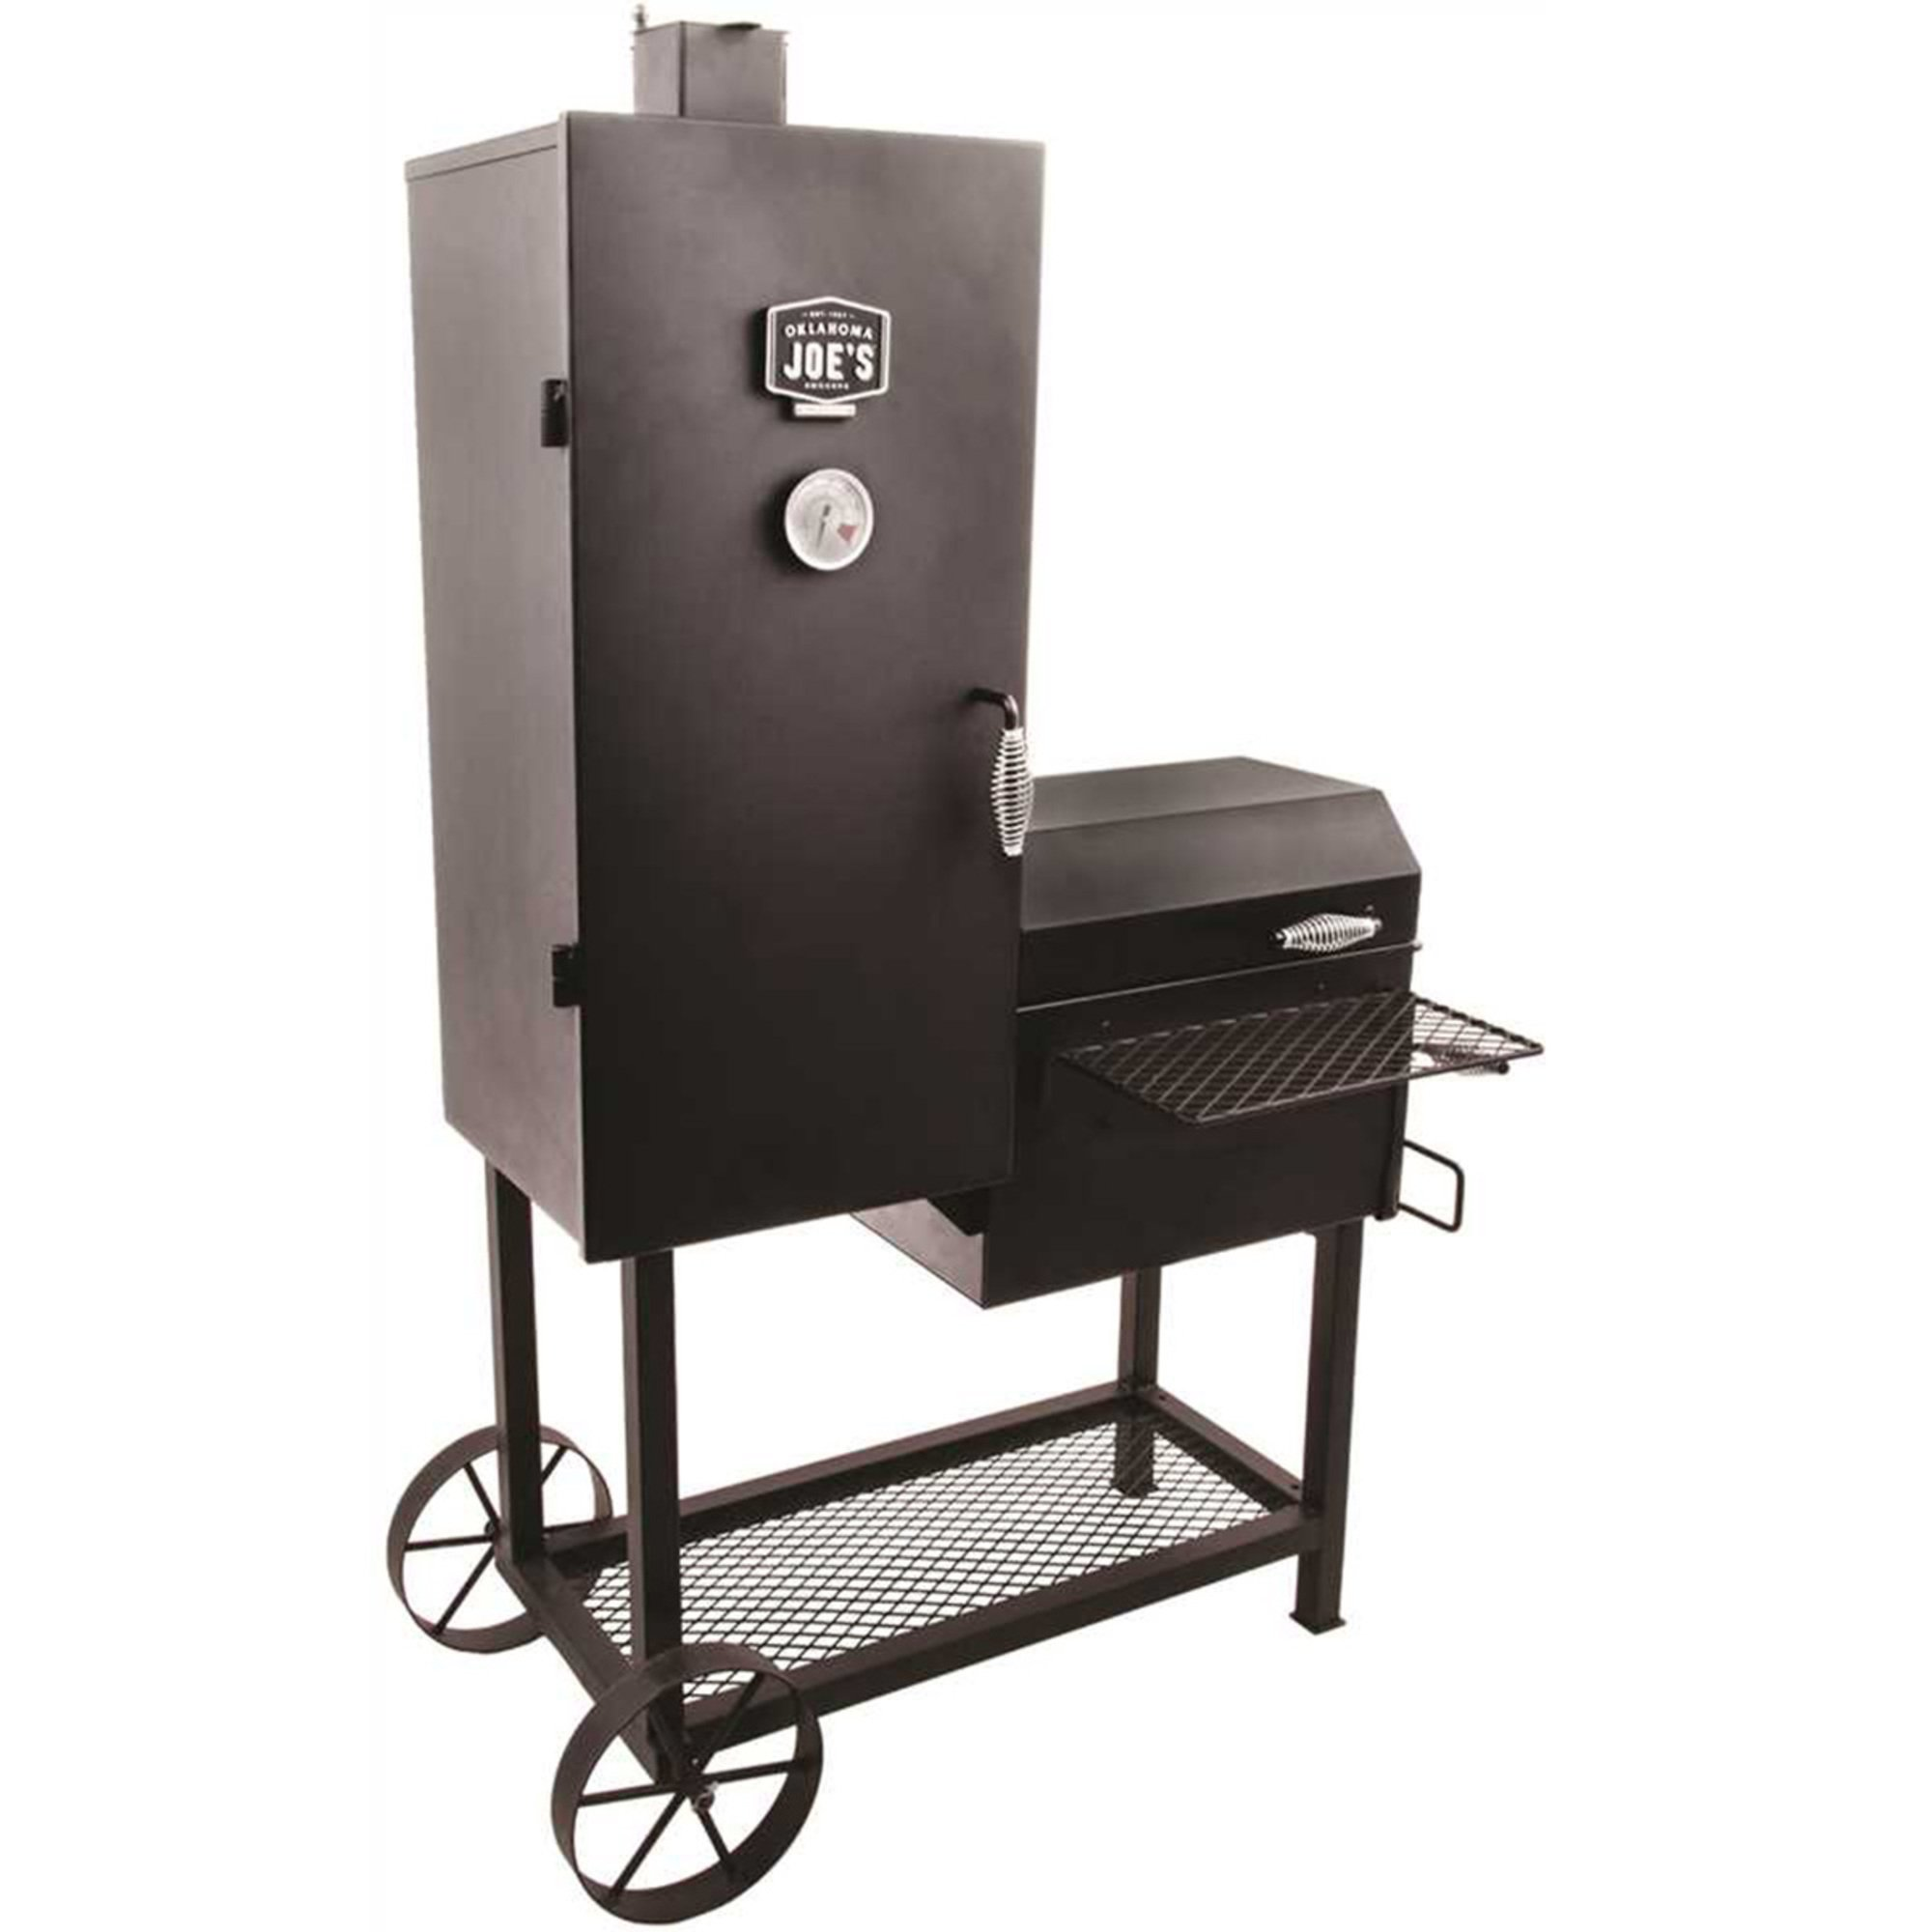 char broil oklahoma joe s bandera smoker smokers outdoor living shop your navy exchange. Black Bedroom Furniture Sets. Home Design Ideas